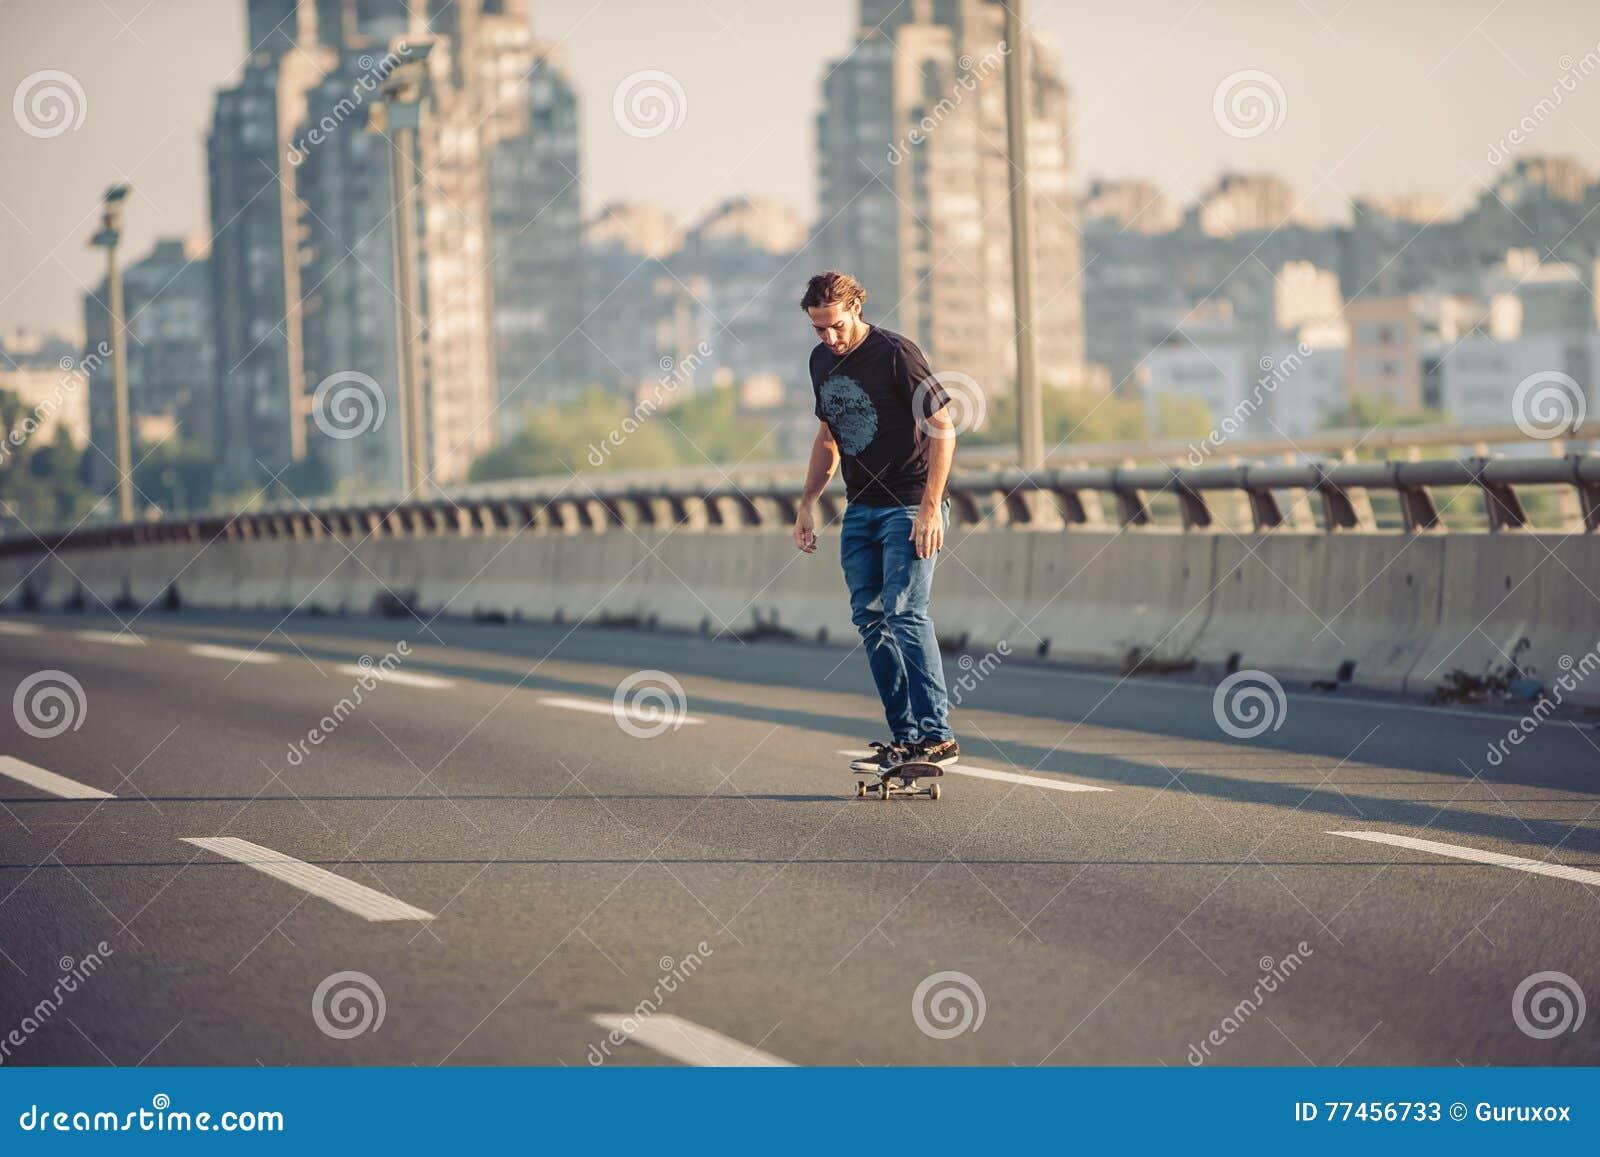 skateboarder riding a skate over a city road bridge free ride s